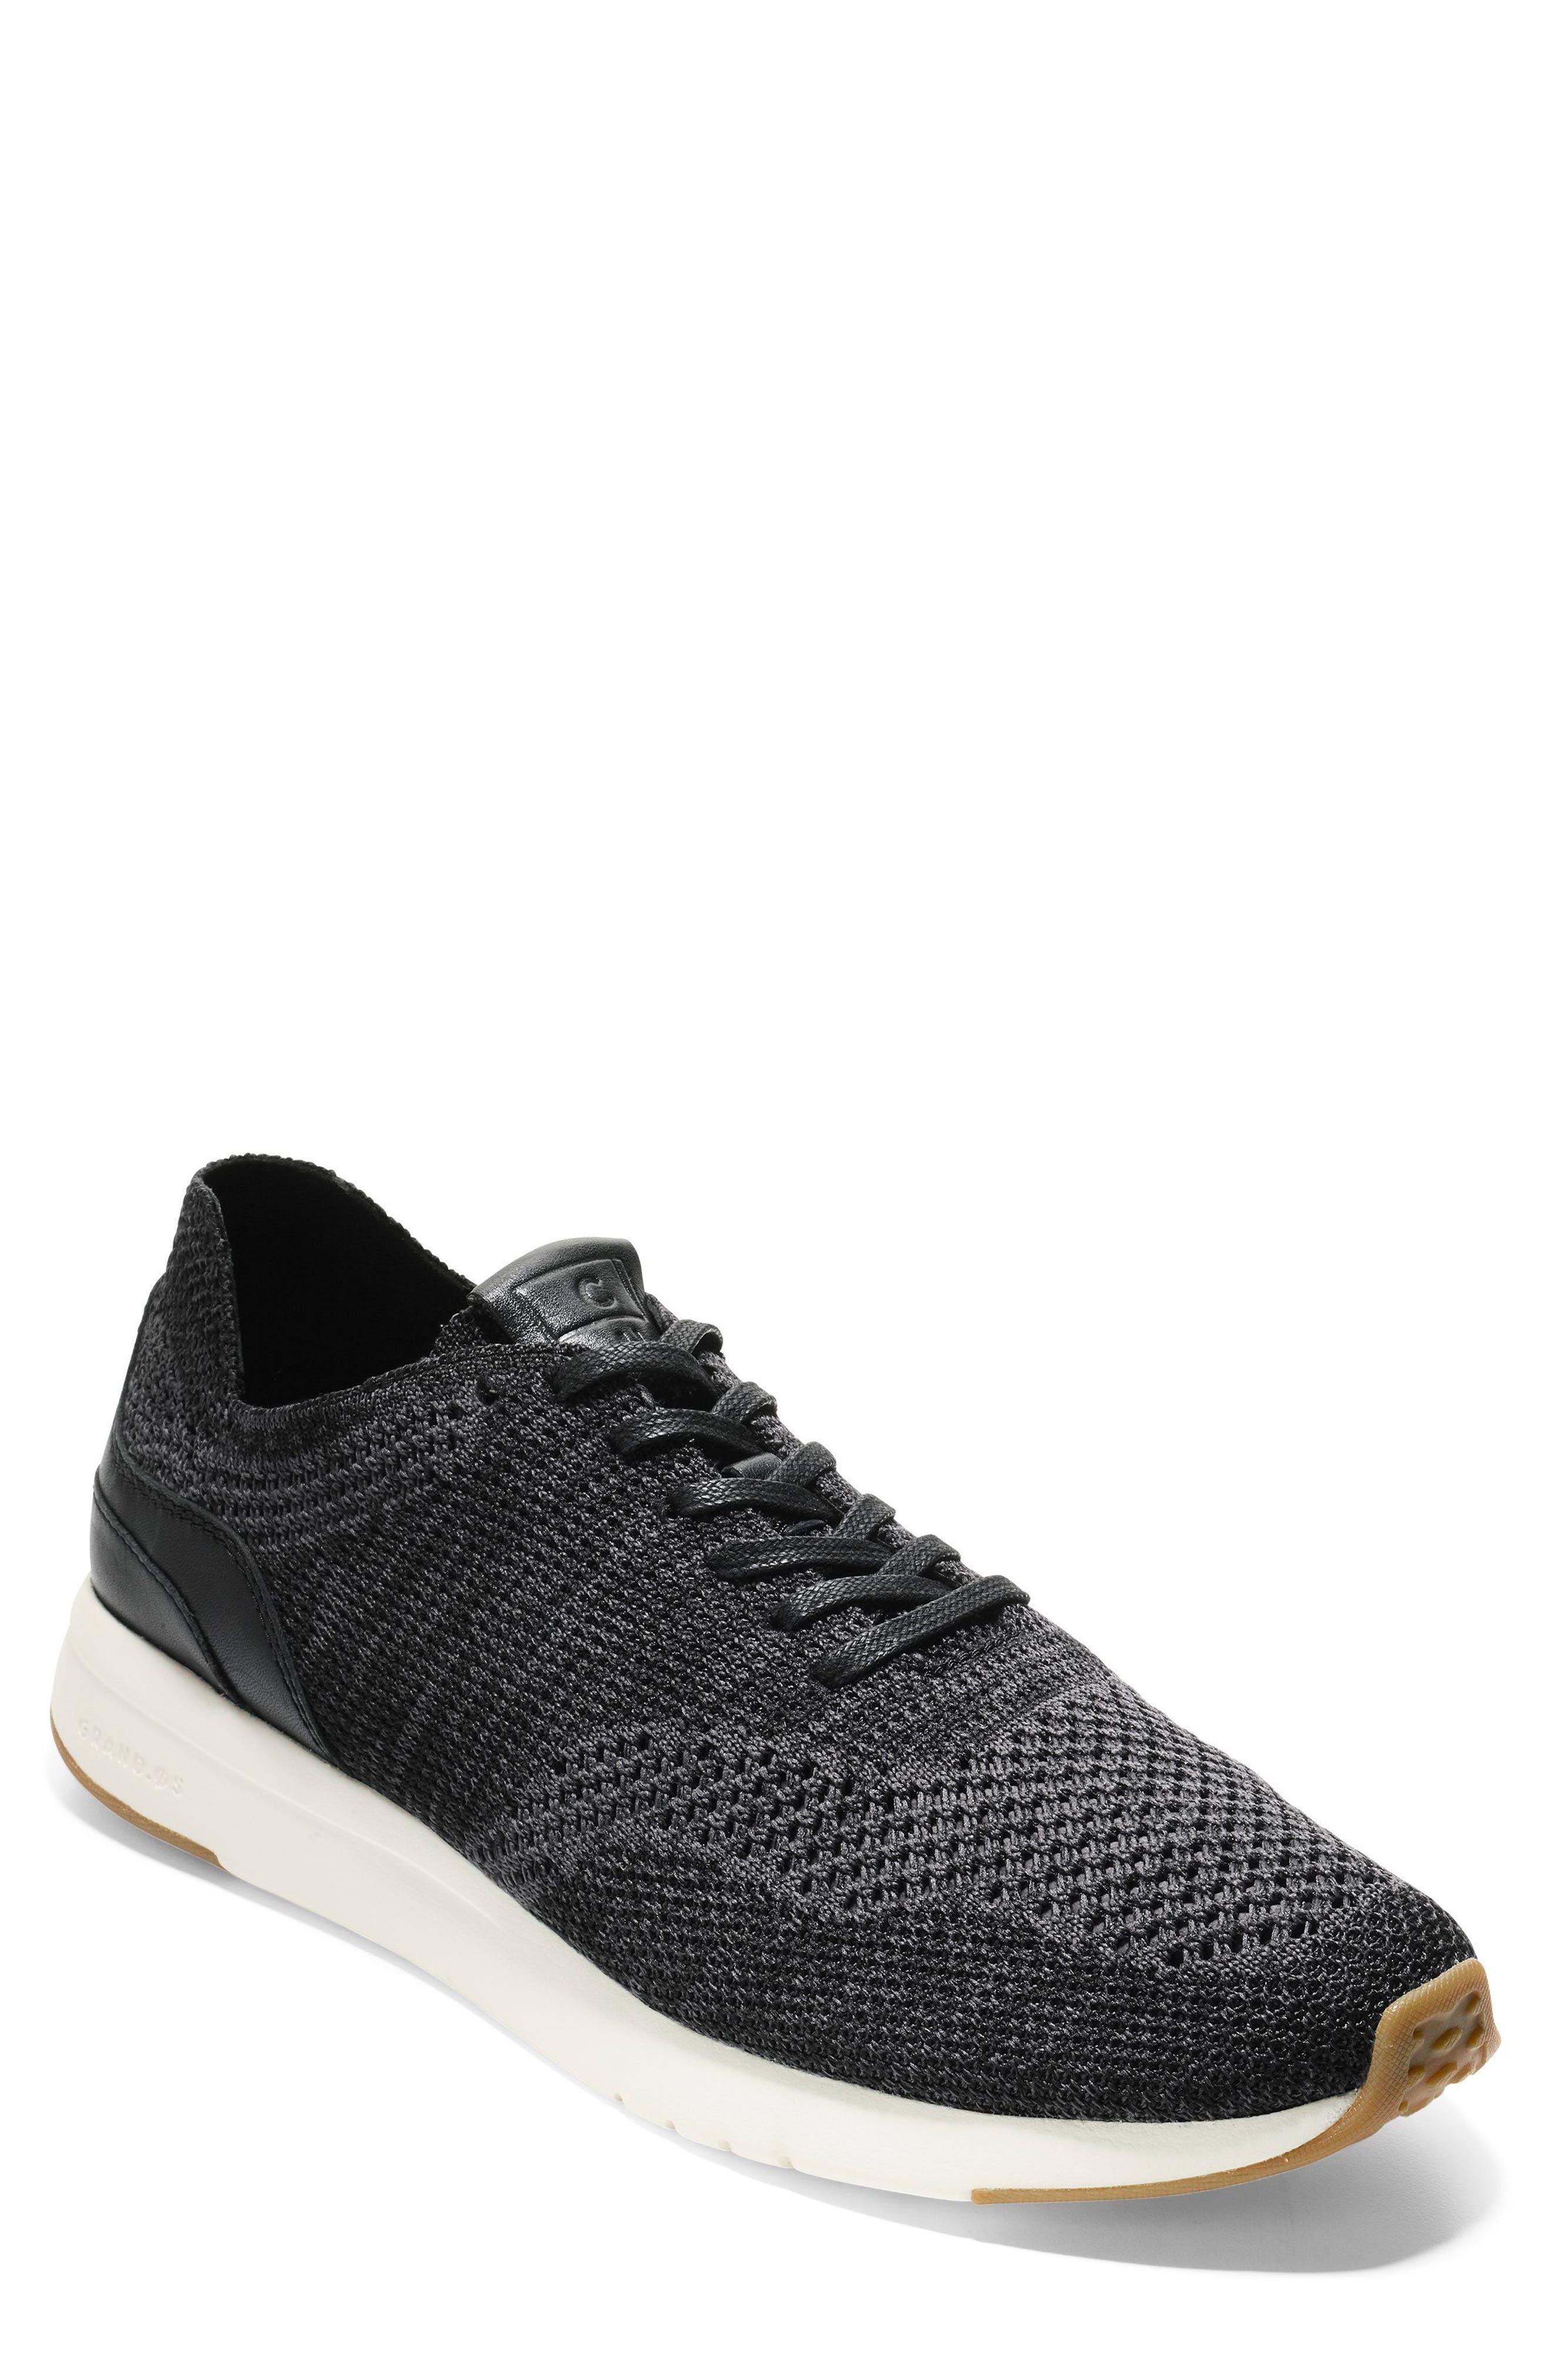 GrandPro Runner Stitchlite Sneaker,                         Main,                         color, Black / Magnet